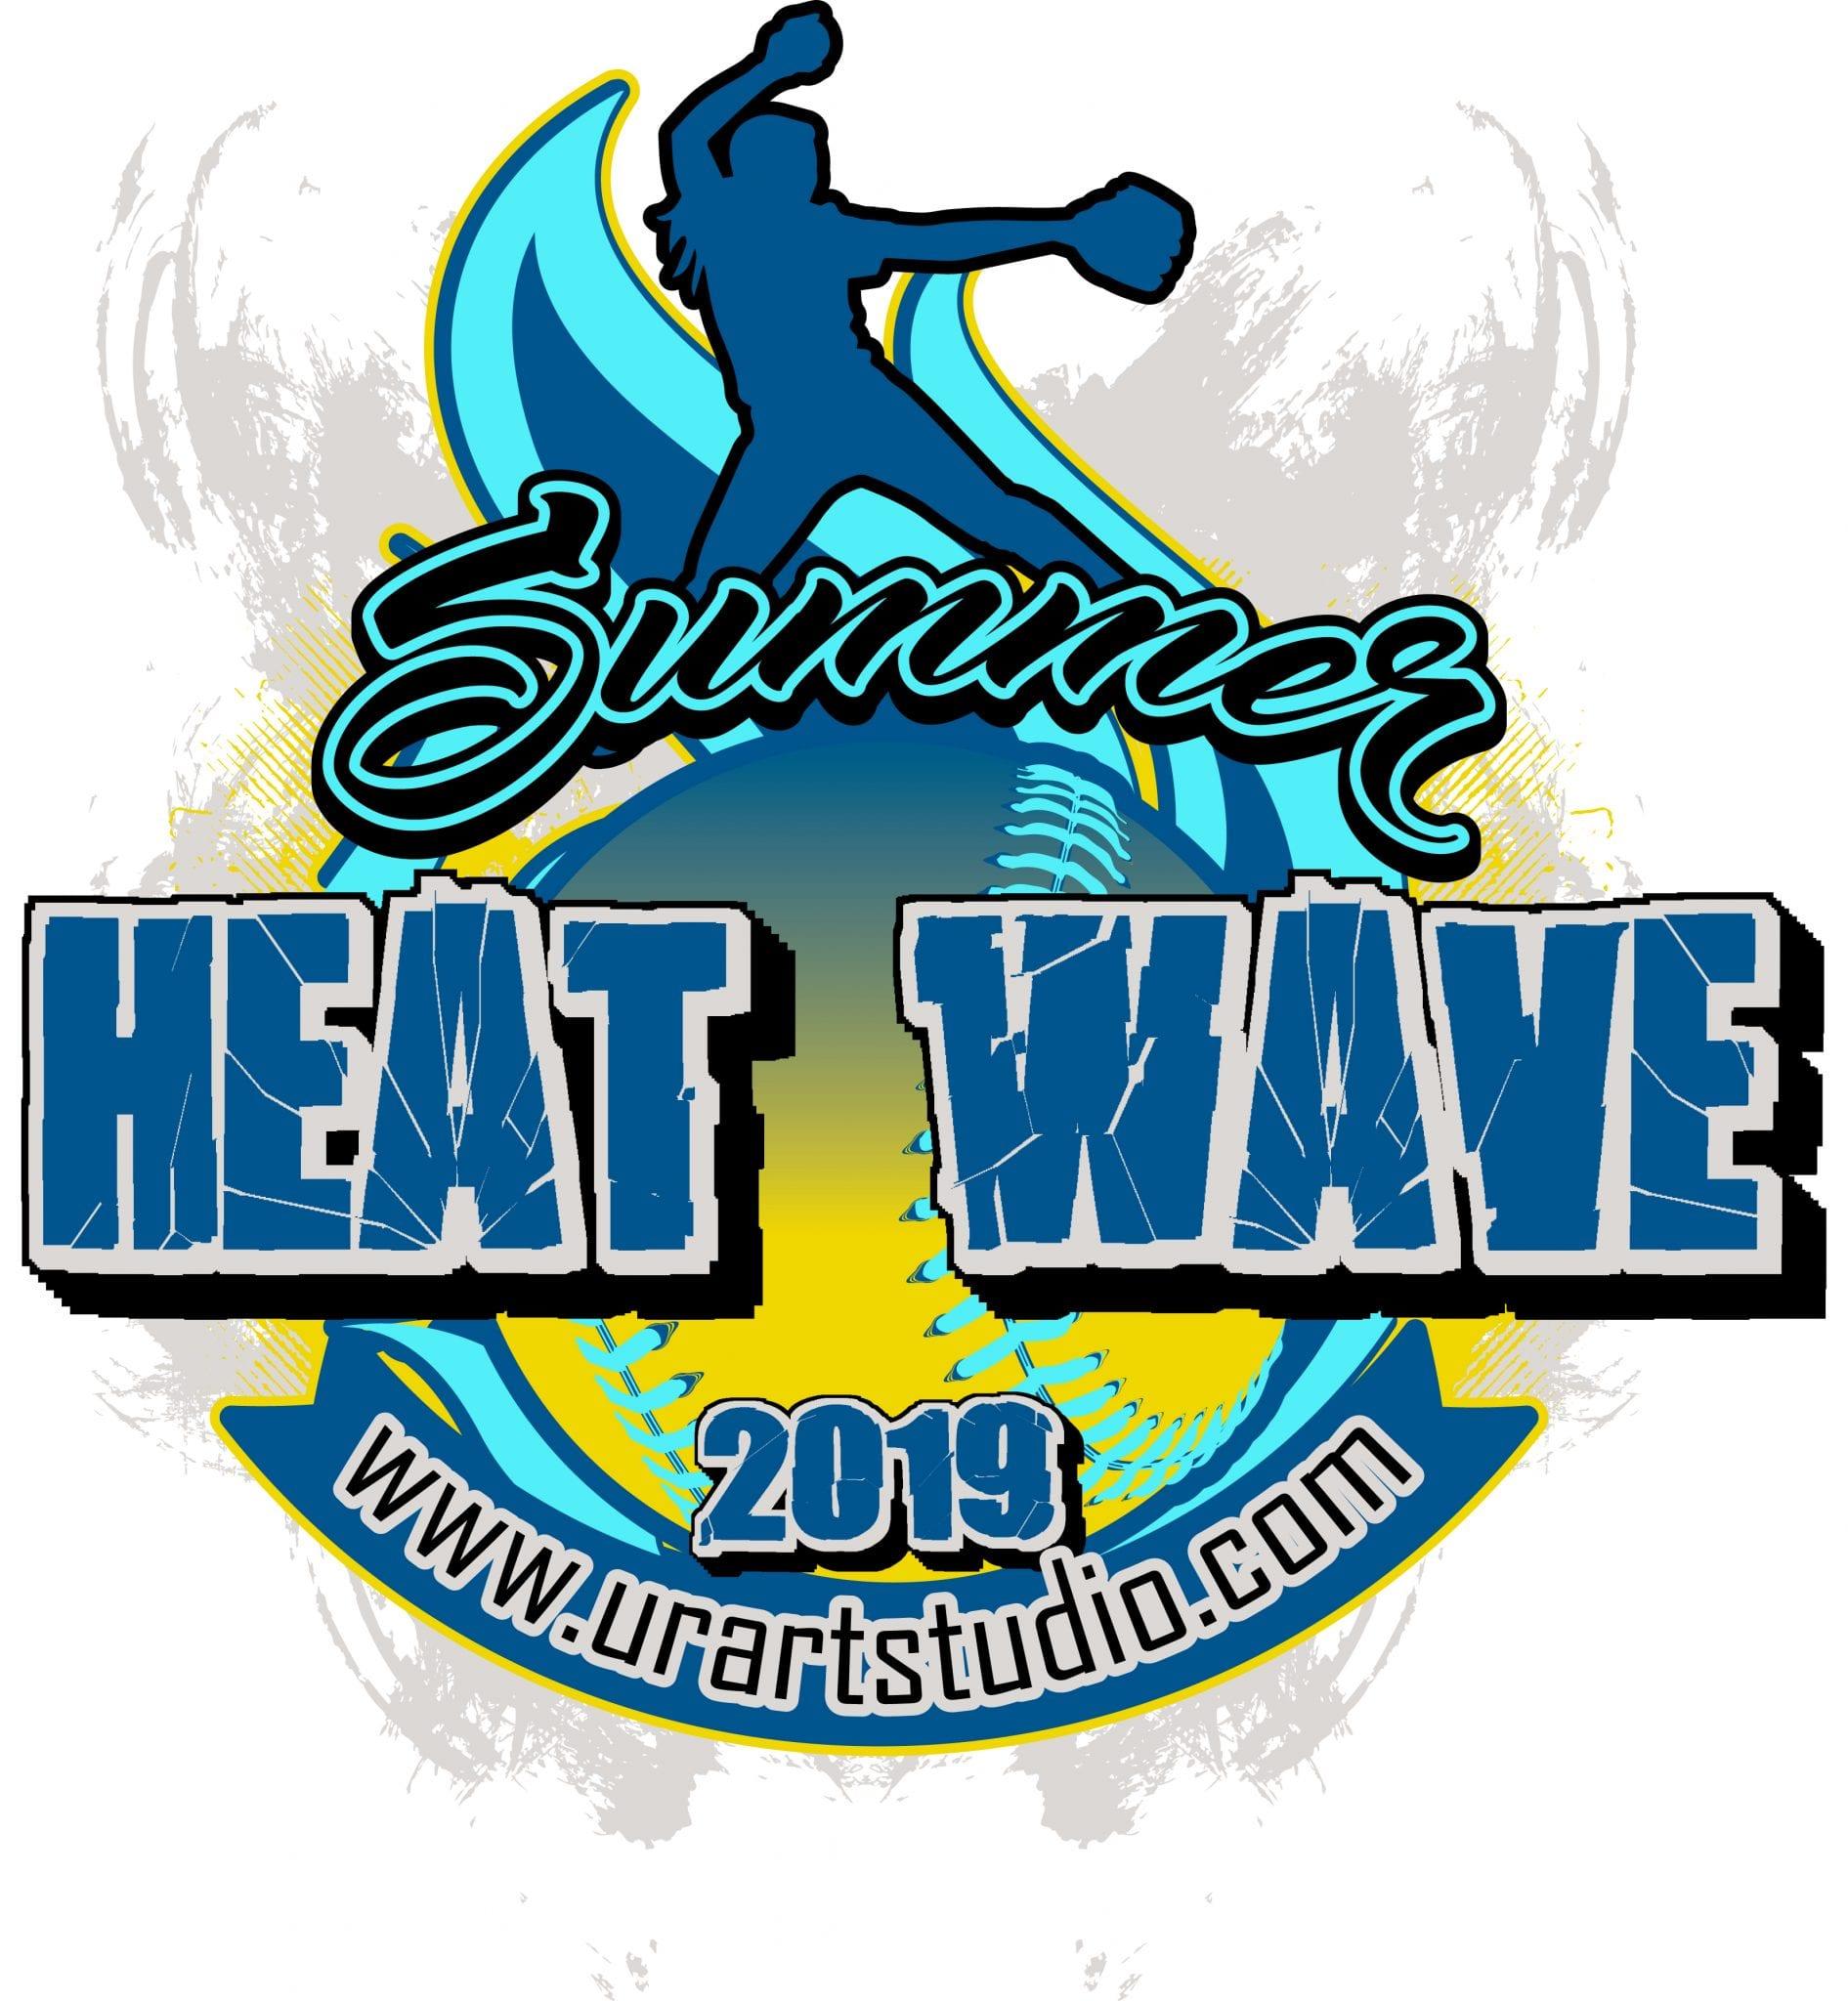 SUMMER HEAT WAVE SOFTBALL customizable T-shirt vector logo design for print 2019